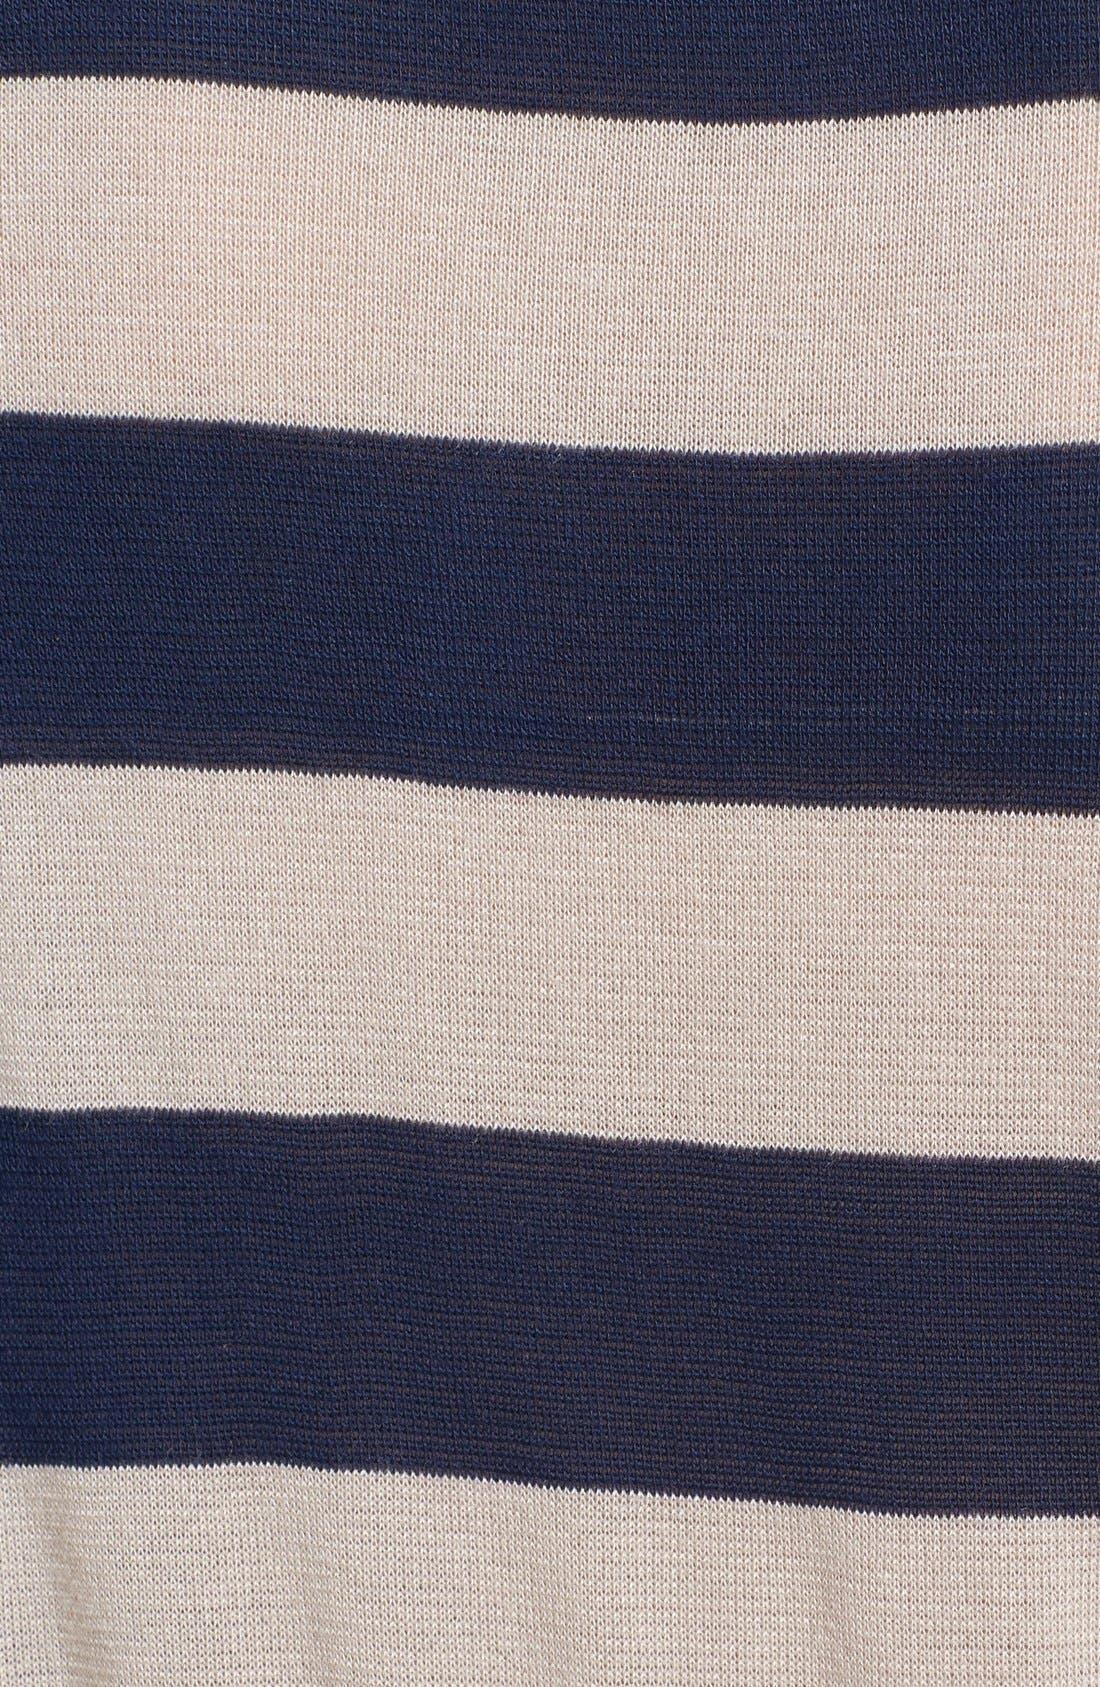 Alternate Image 3  - Olivia Moon Woven Sleeve Pullover